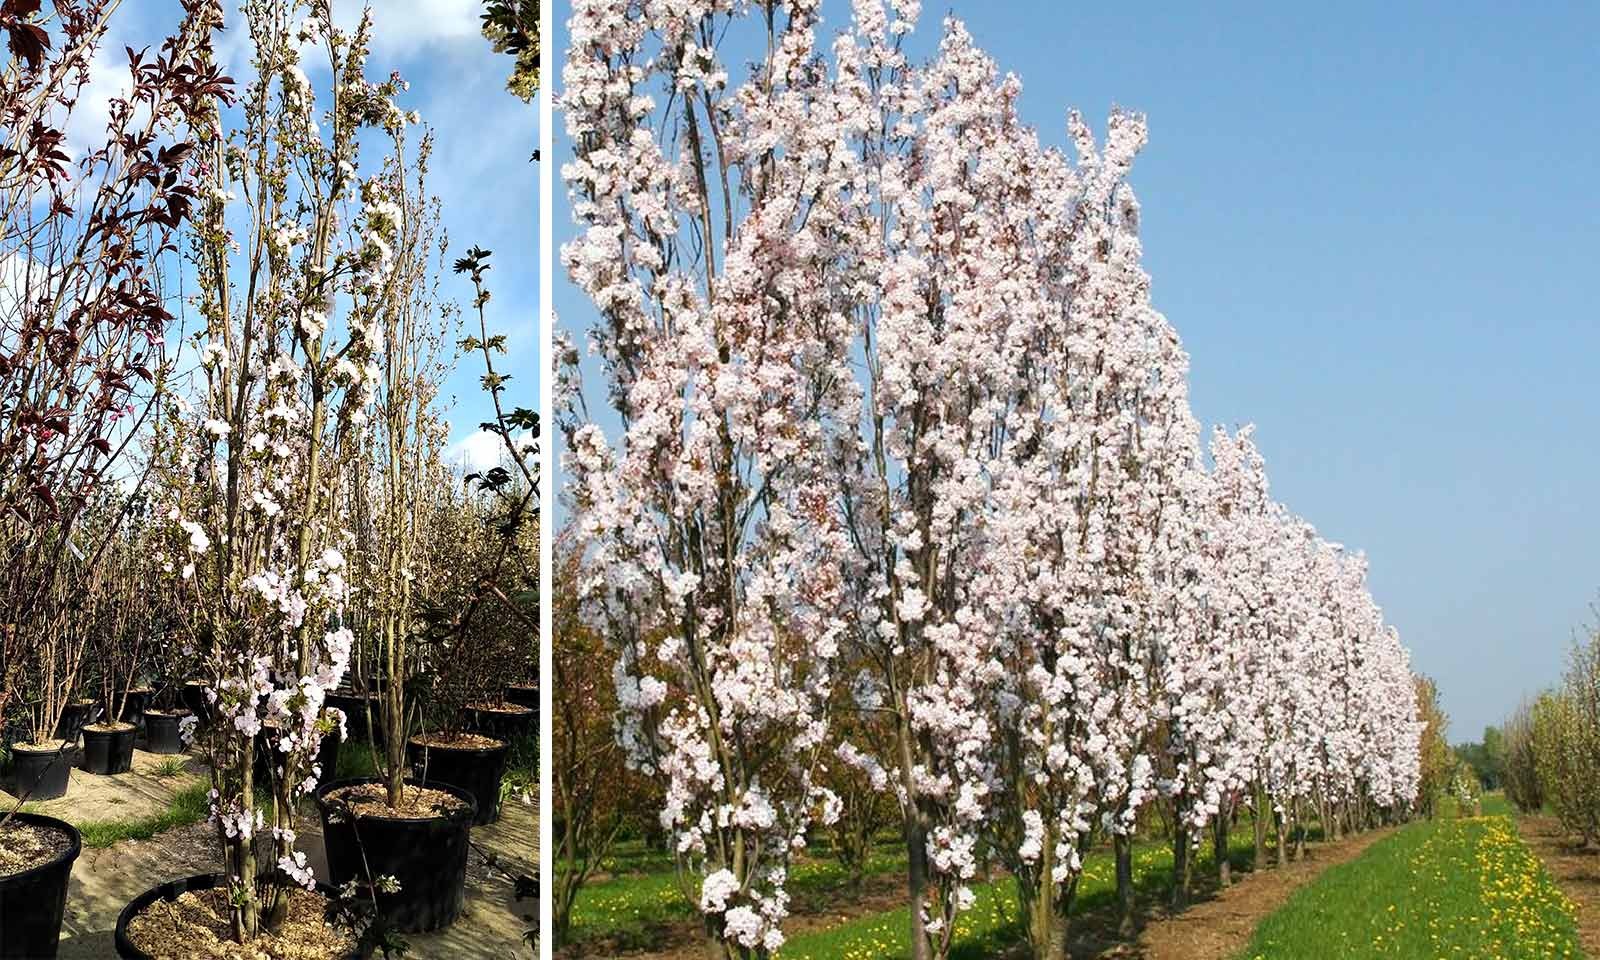 Prunus Serrulata 'Amanogawa' (Japanese Flowering Cherry 'Amanogawa')